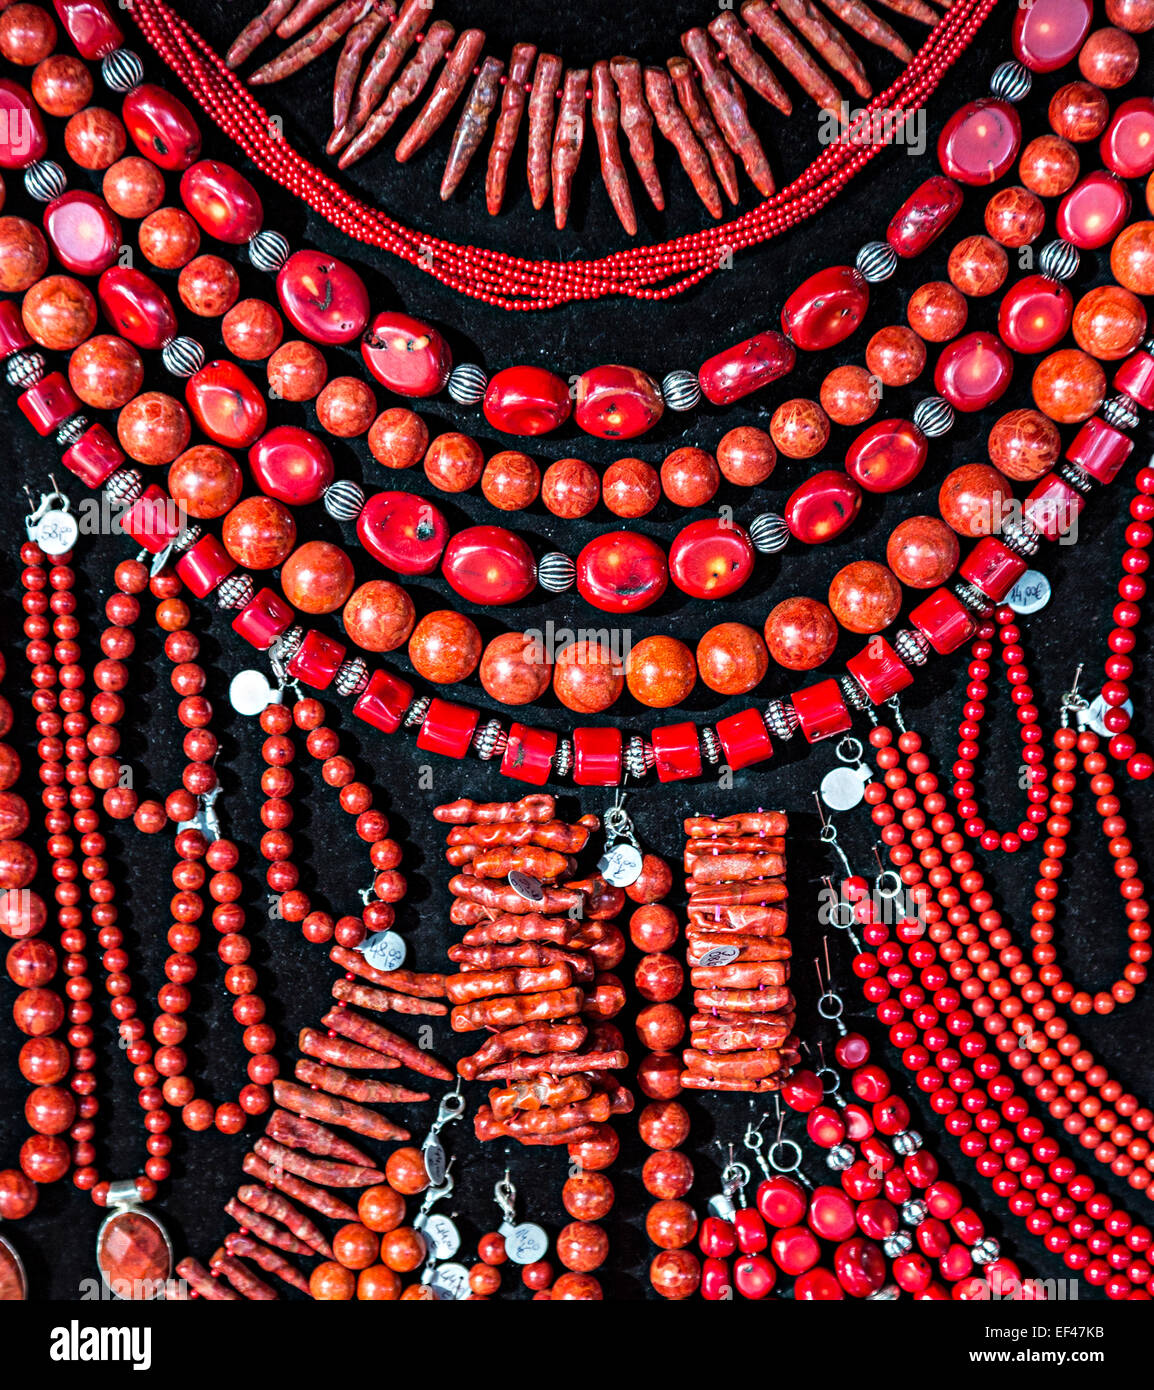 Bambusna korala, bamboo coral, jewelry on sale, Postojna, Slovenia - Stock Image